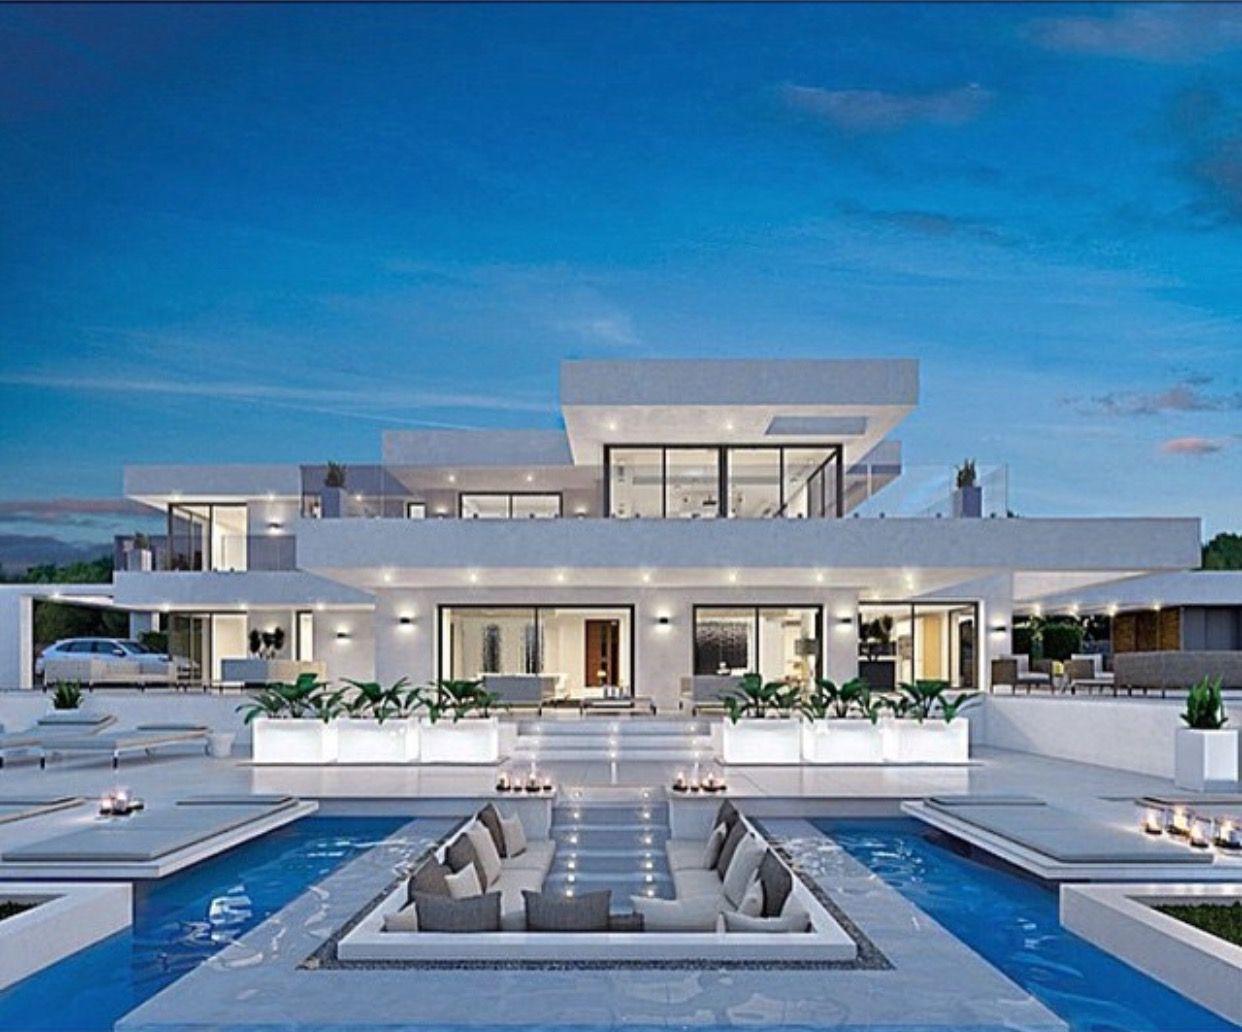 Une Villa De Luxe  Luxe, Vacances, Villas De Luxe Plus